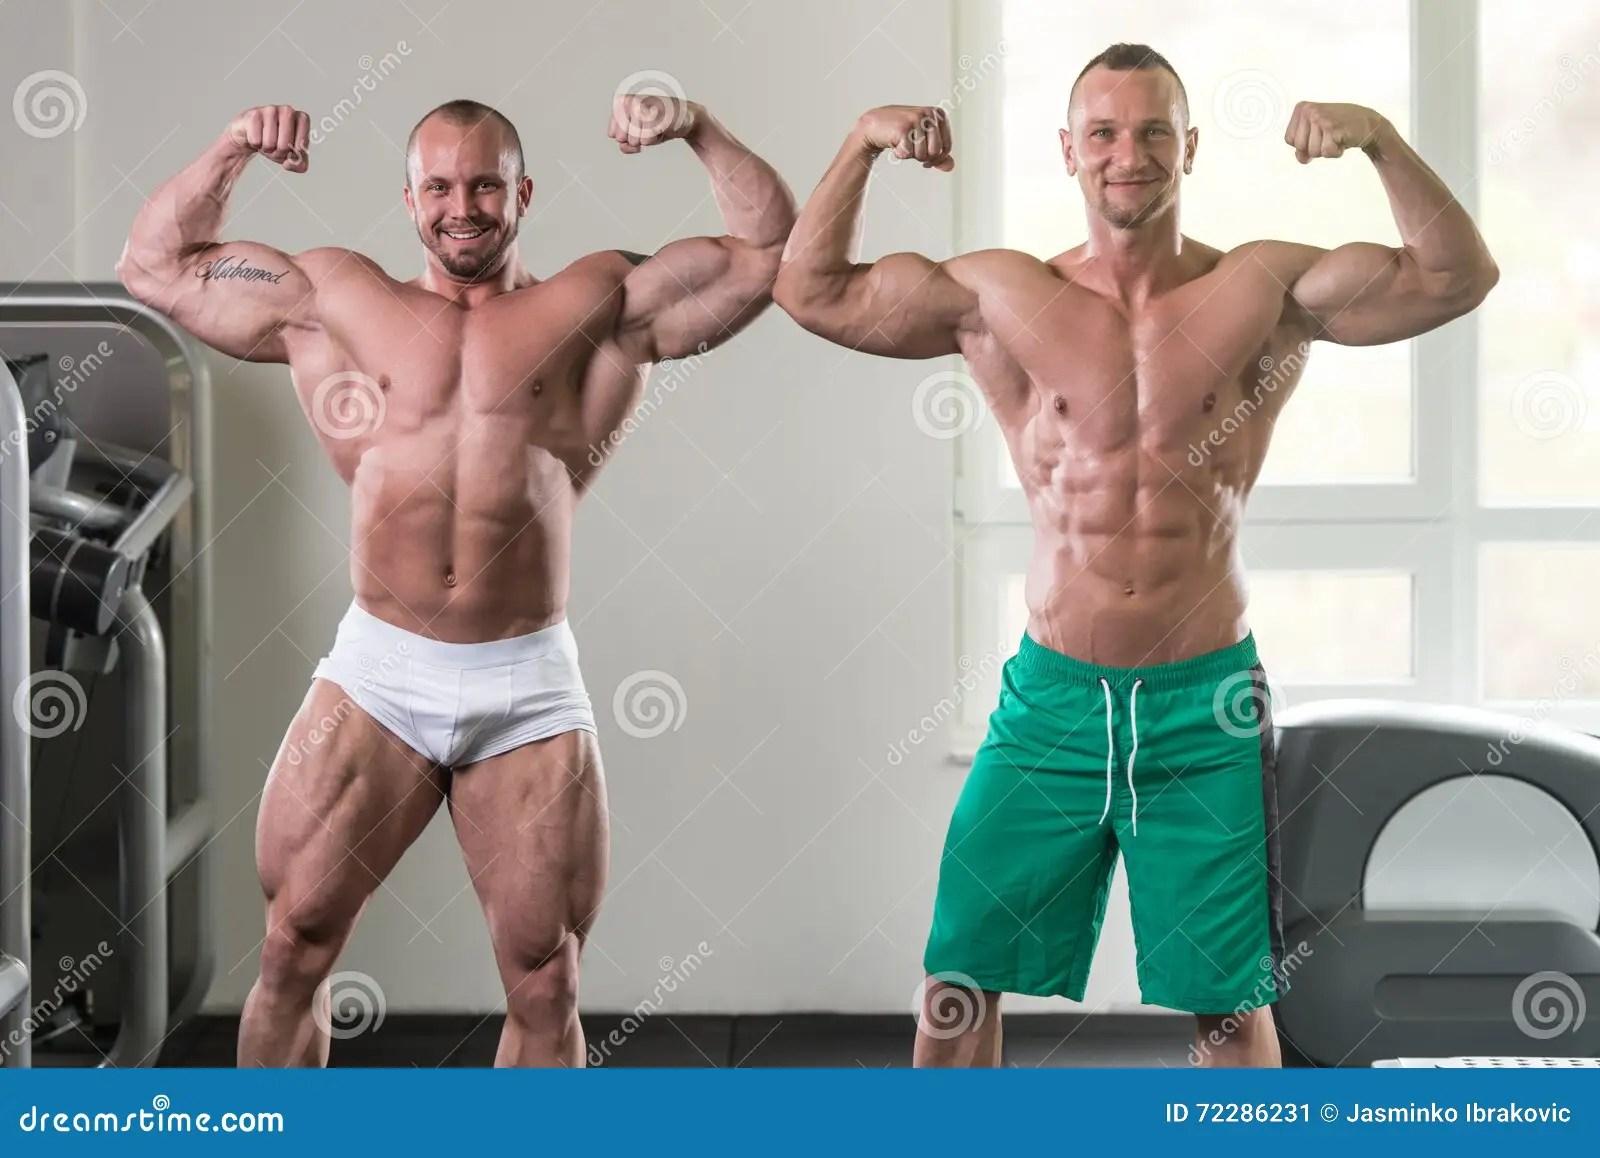 two muscular men flexing